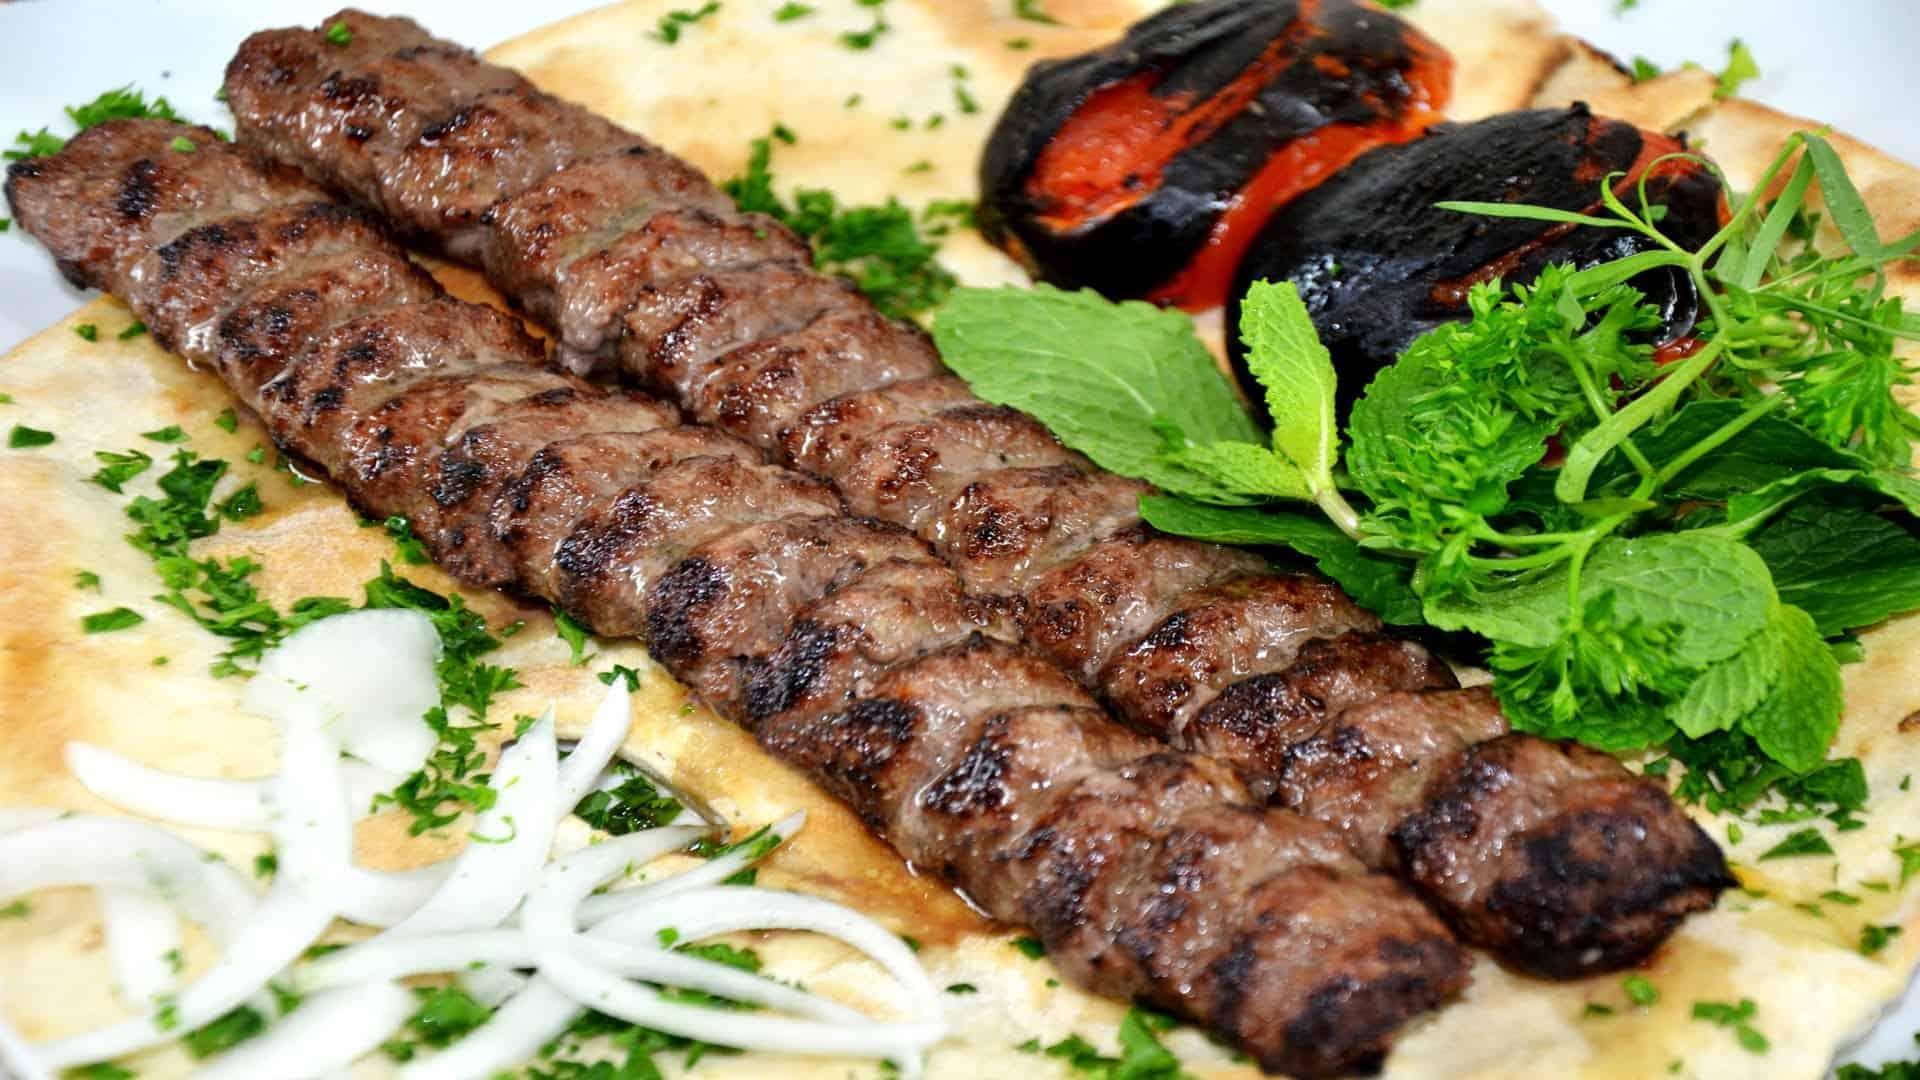 Kabab wa kofta